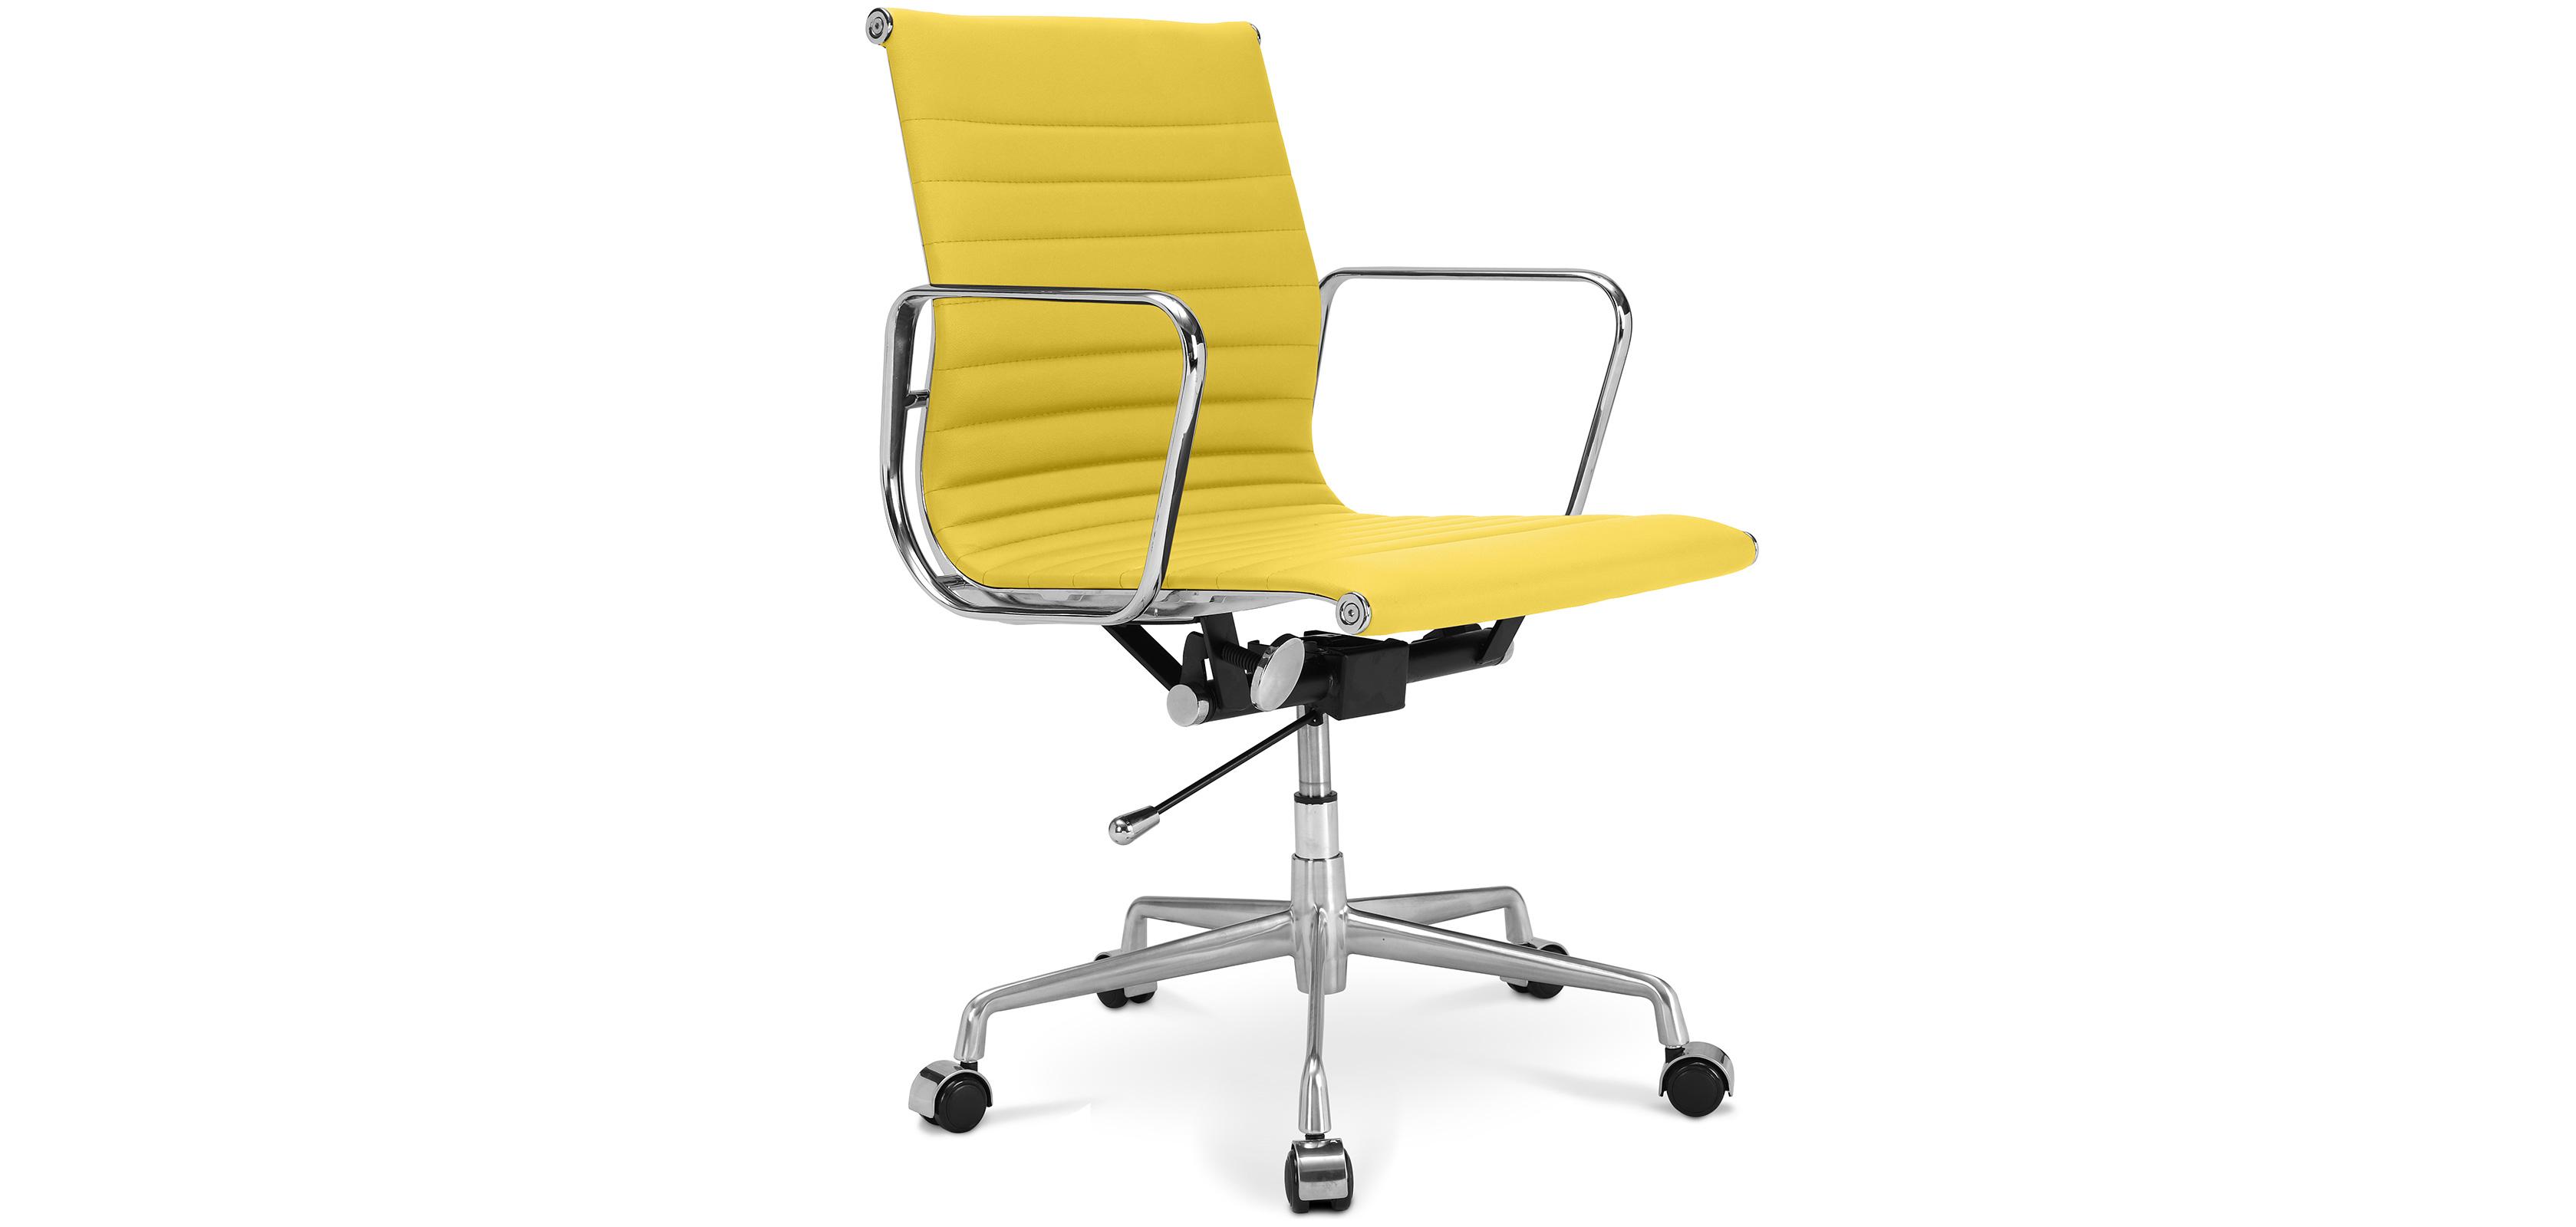 Chaise bureau alu group ea 117 charles eames for Charles eames chaise bureau